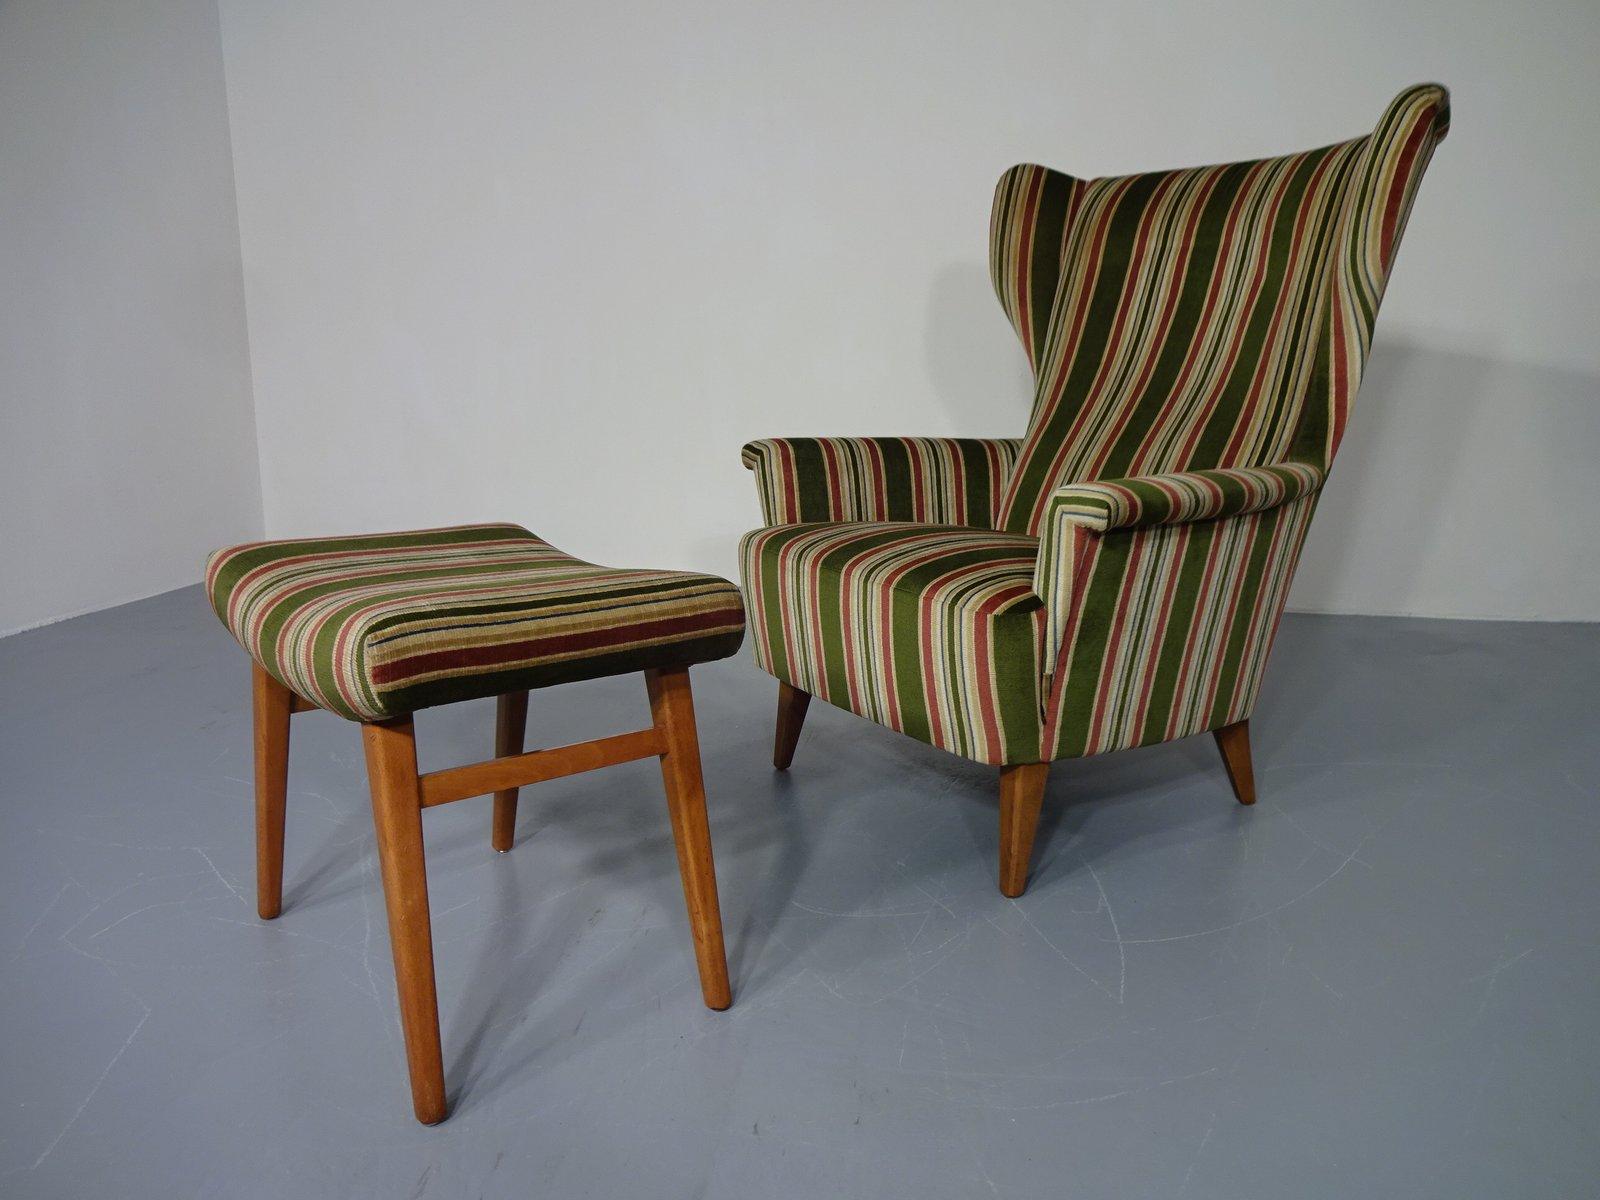 Wingback Chair U0026 Ottoman, 1950s